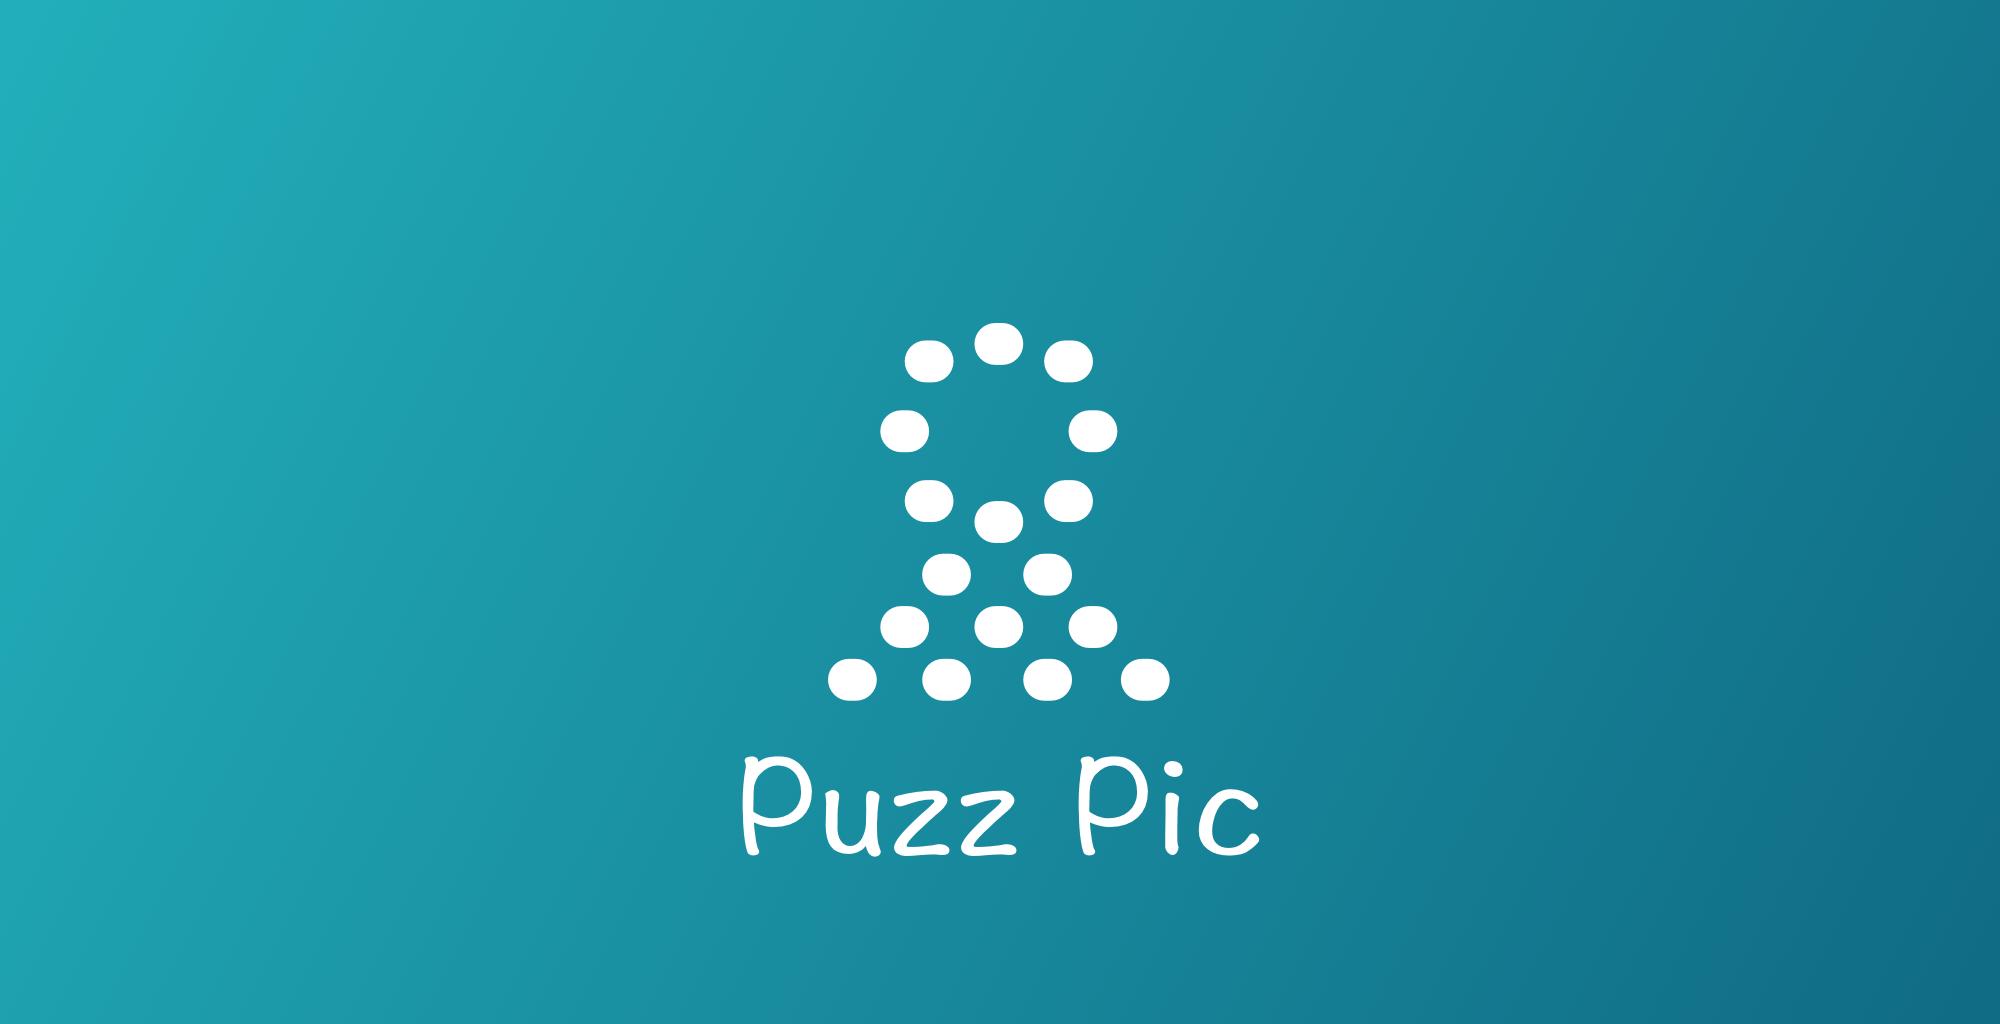 Puzzpic